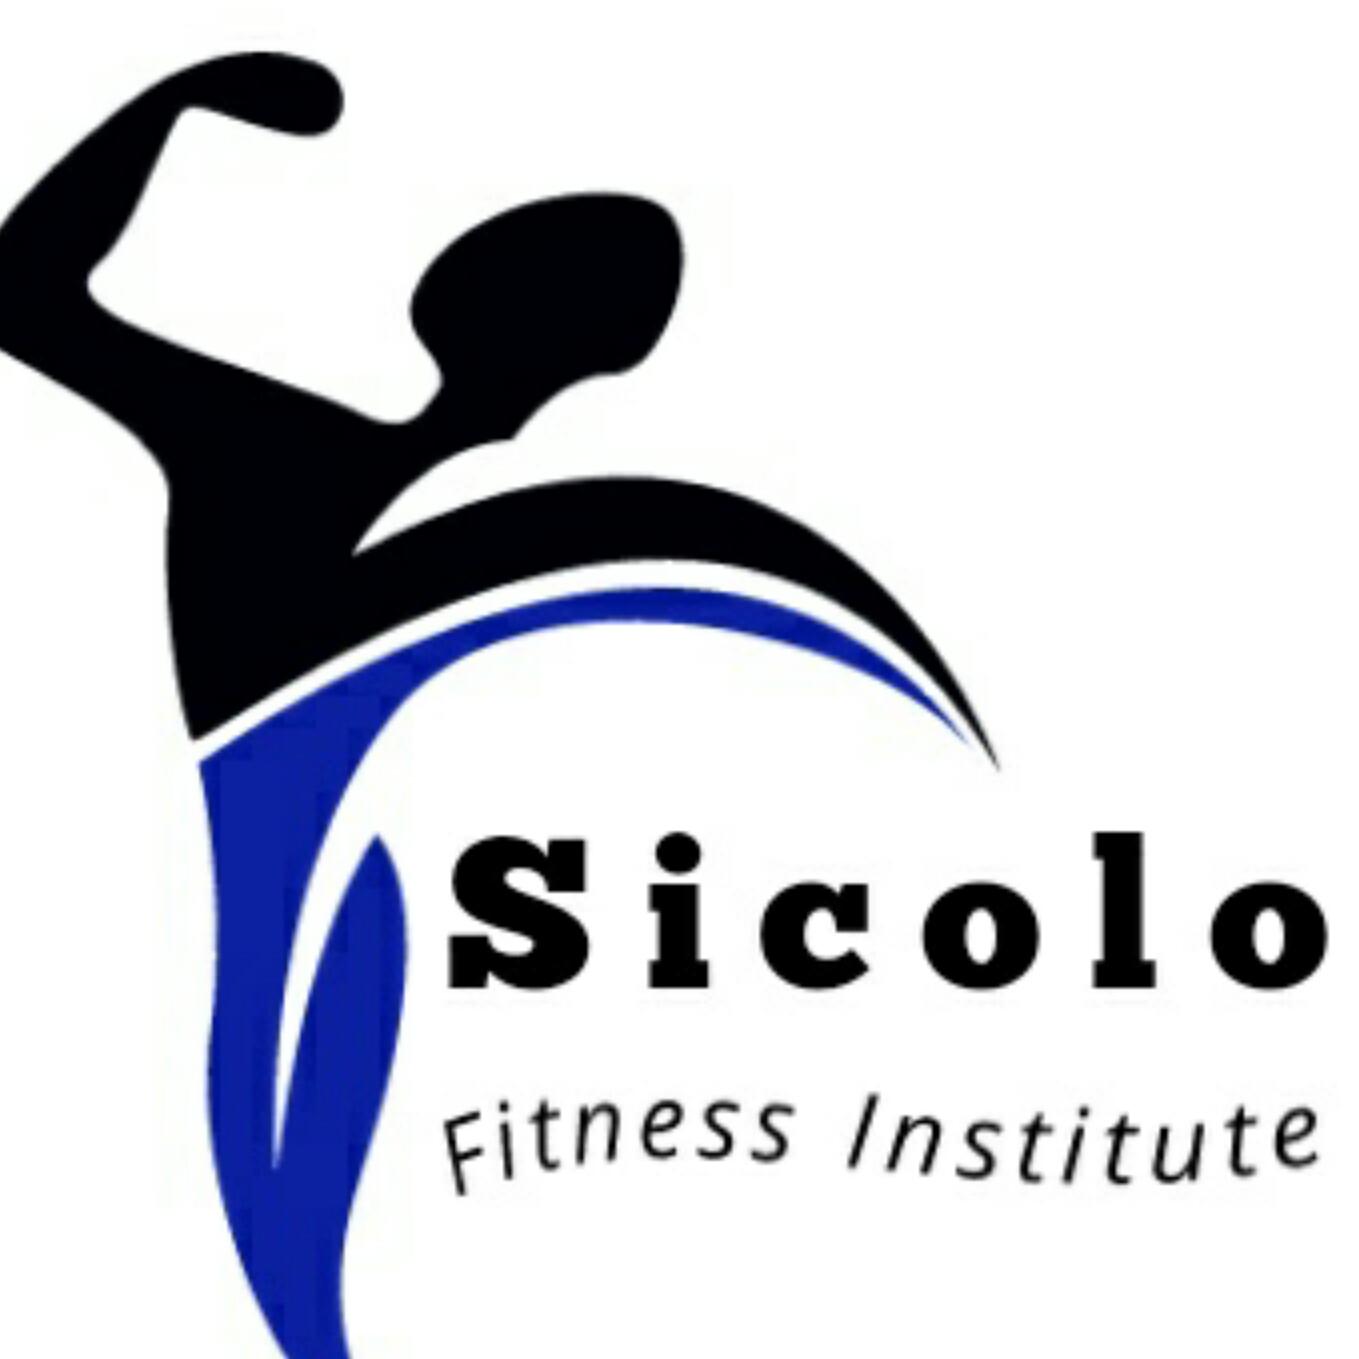 Sicolo Fitness Institute